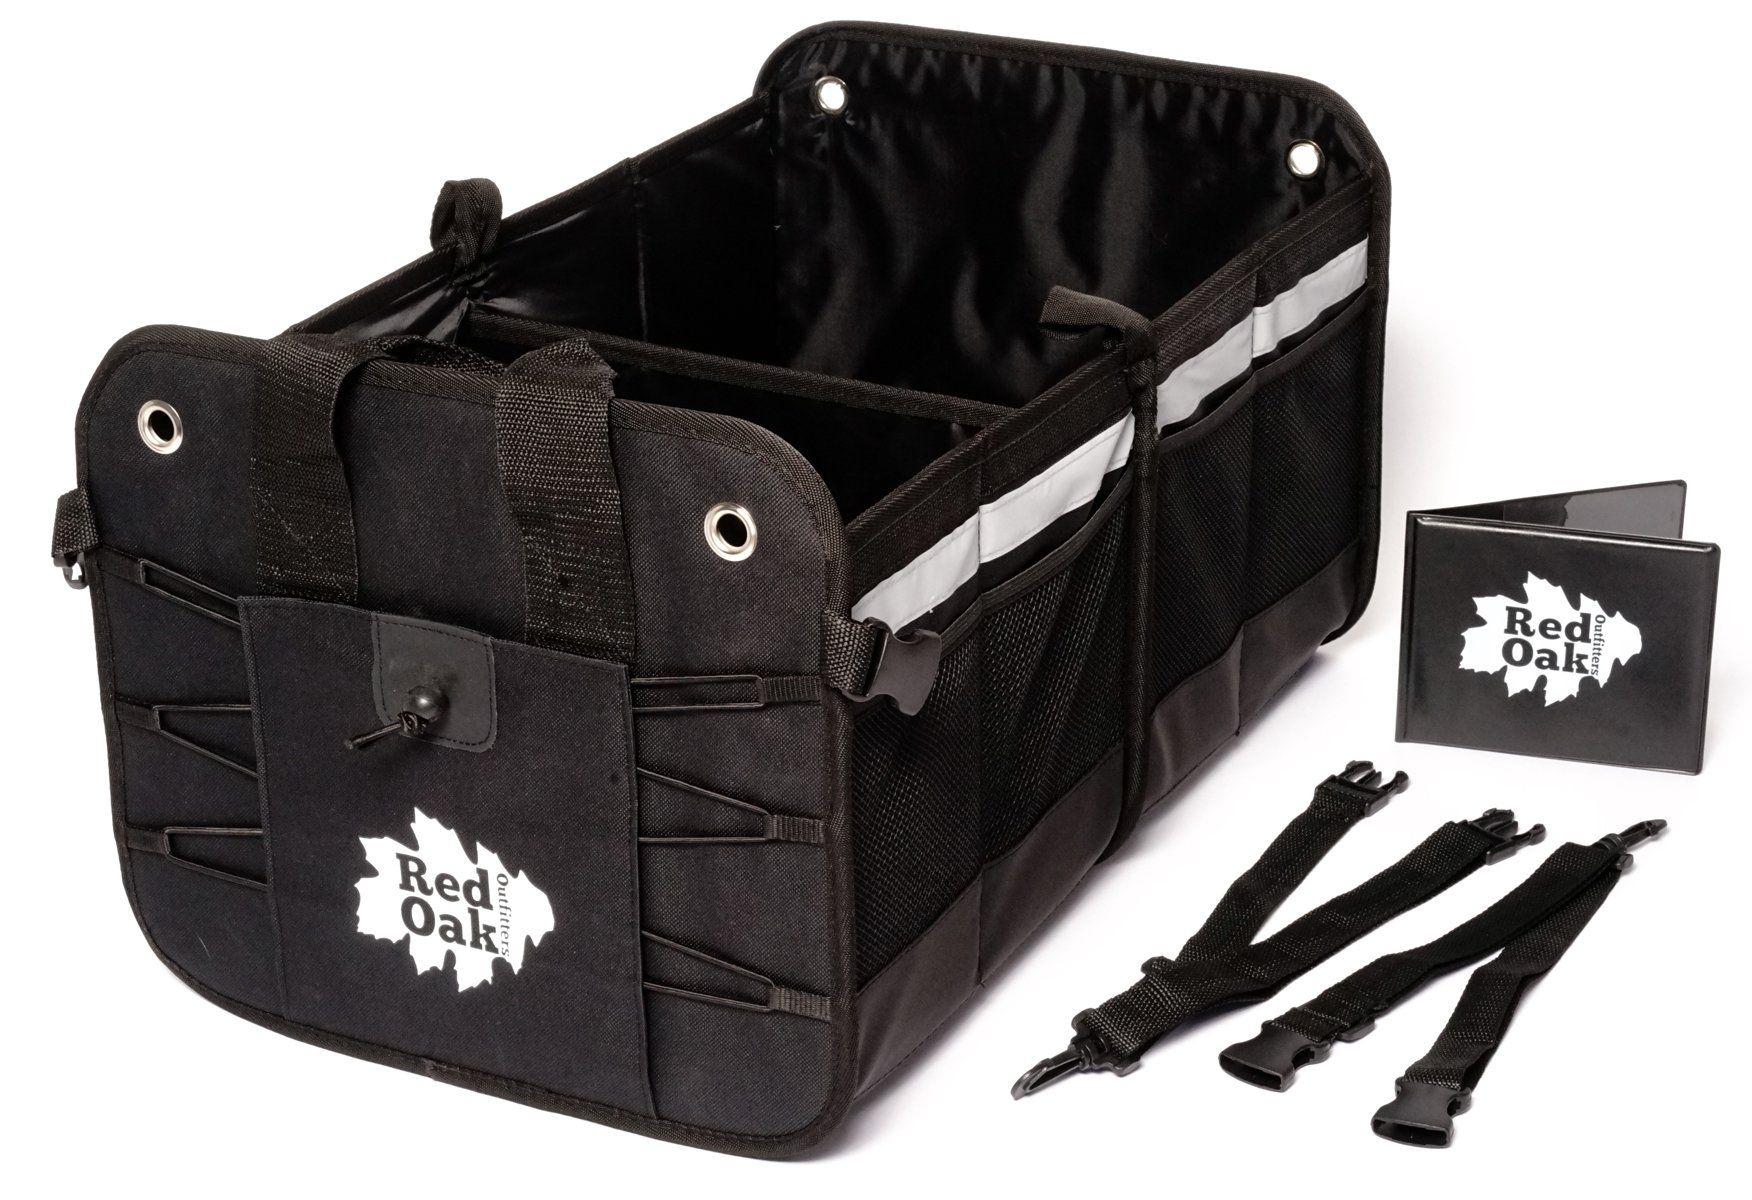 Premium Car Trunk Organizer Foldable Cargo Container Sturdy